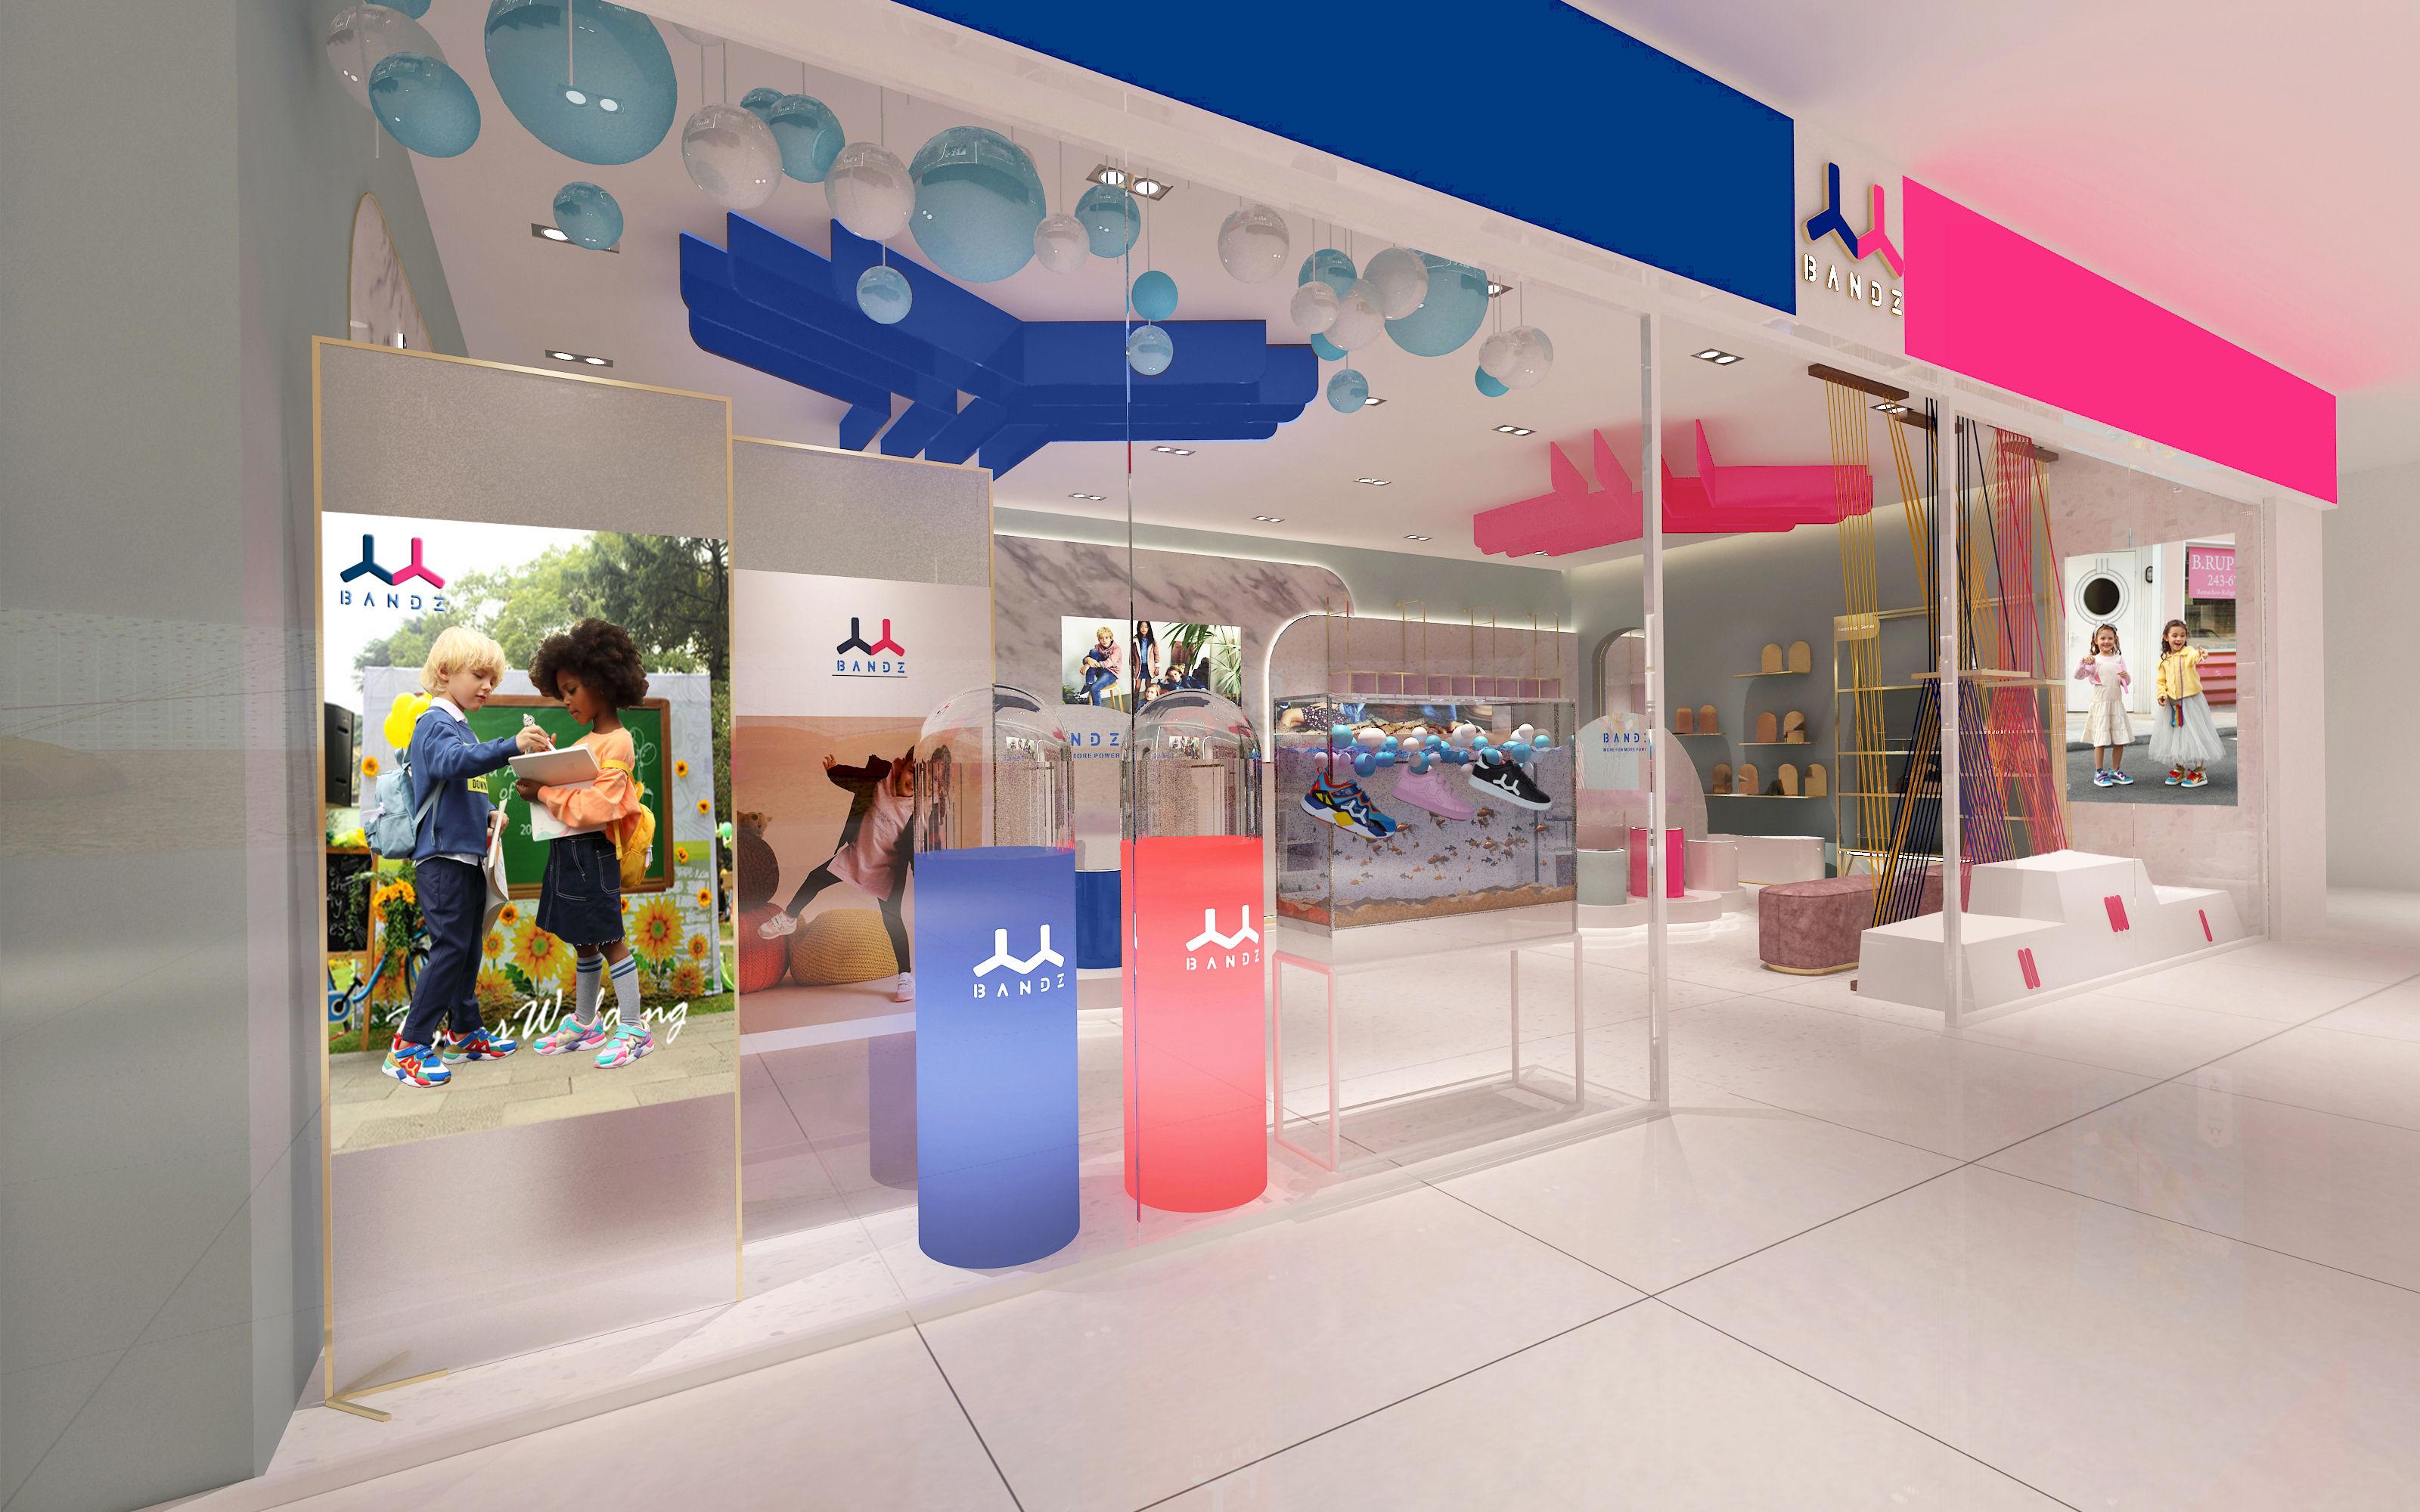 BANDZ班队长举办杭州品鉴洽谈会 | 打造童鞋市场新赛道